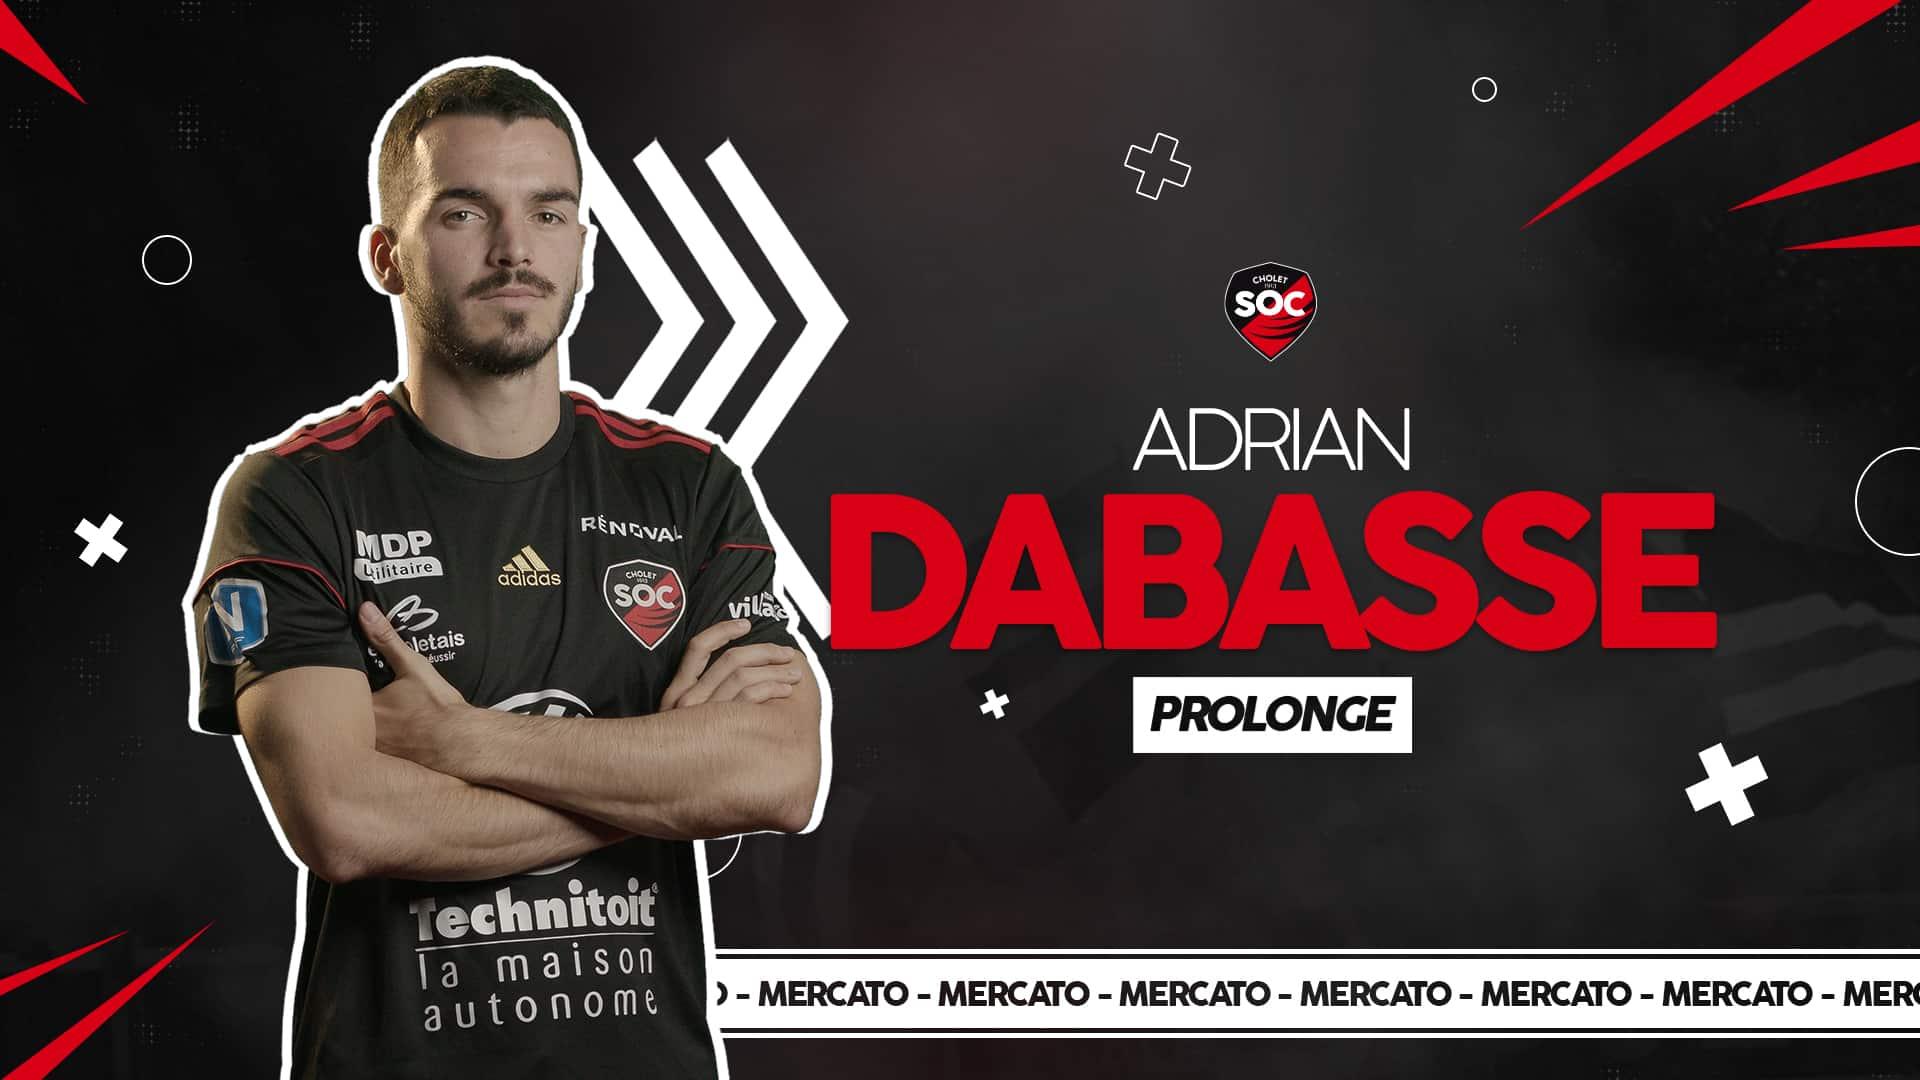 Adrian Dabasse Prolonge